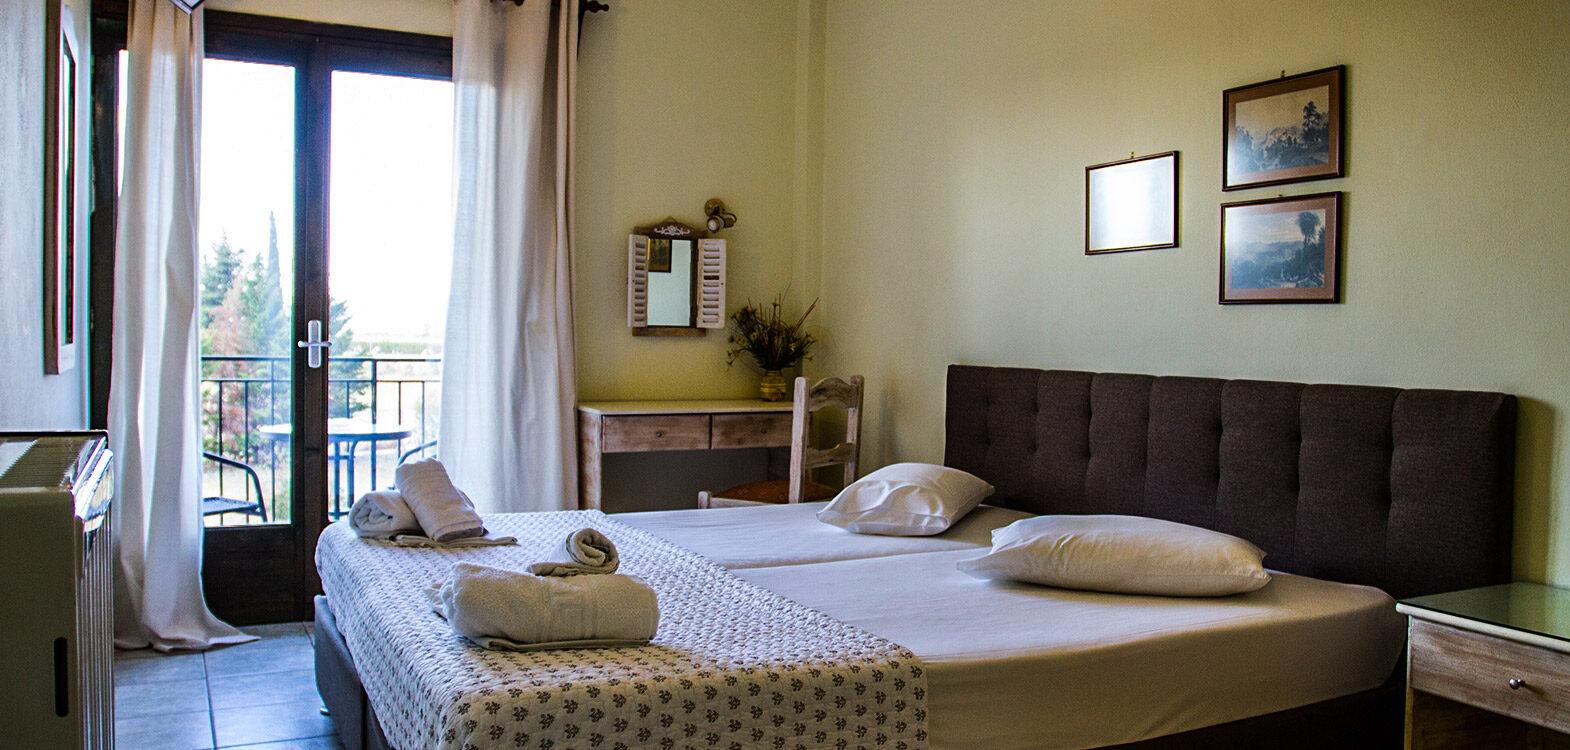 HOTEL ALOS - ΔΙΚΛΙΝΟ